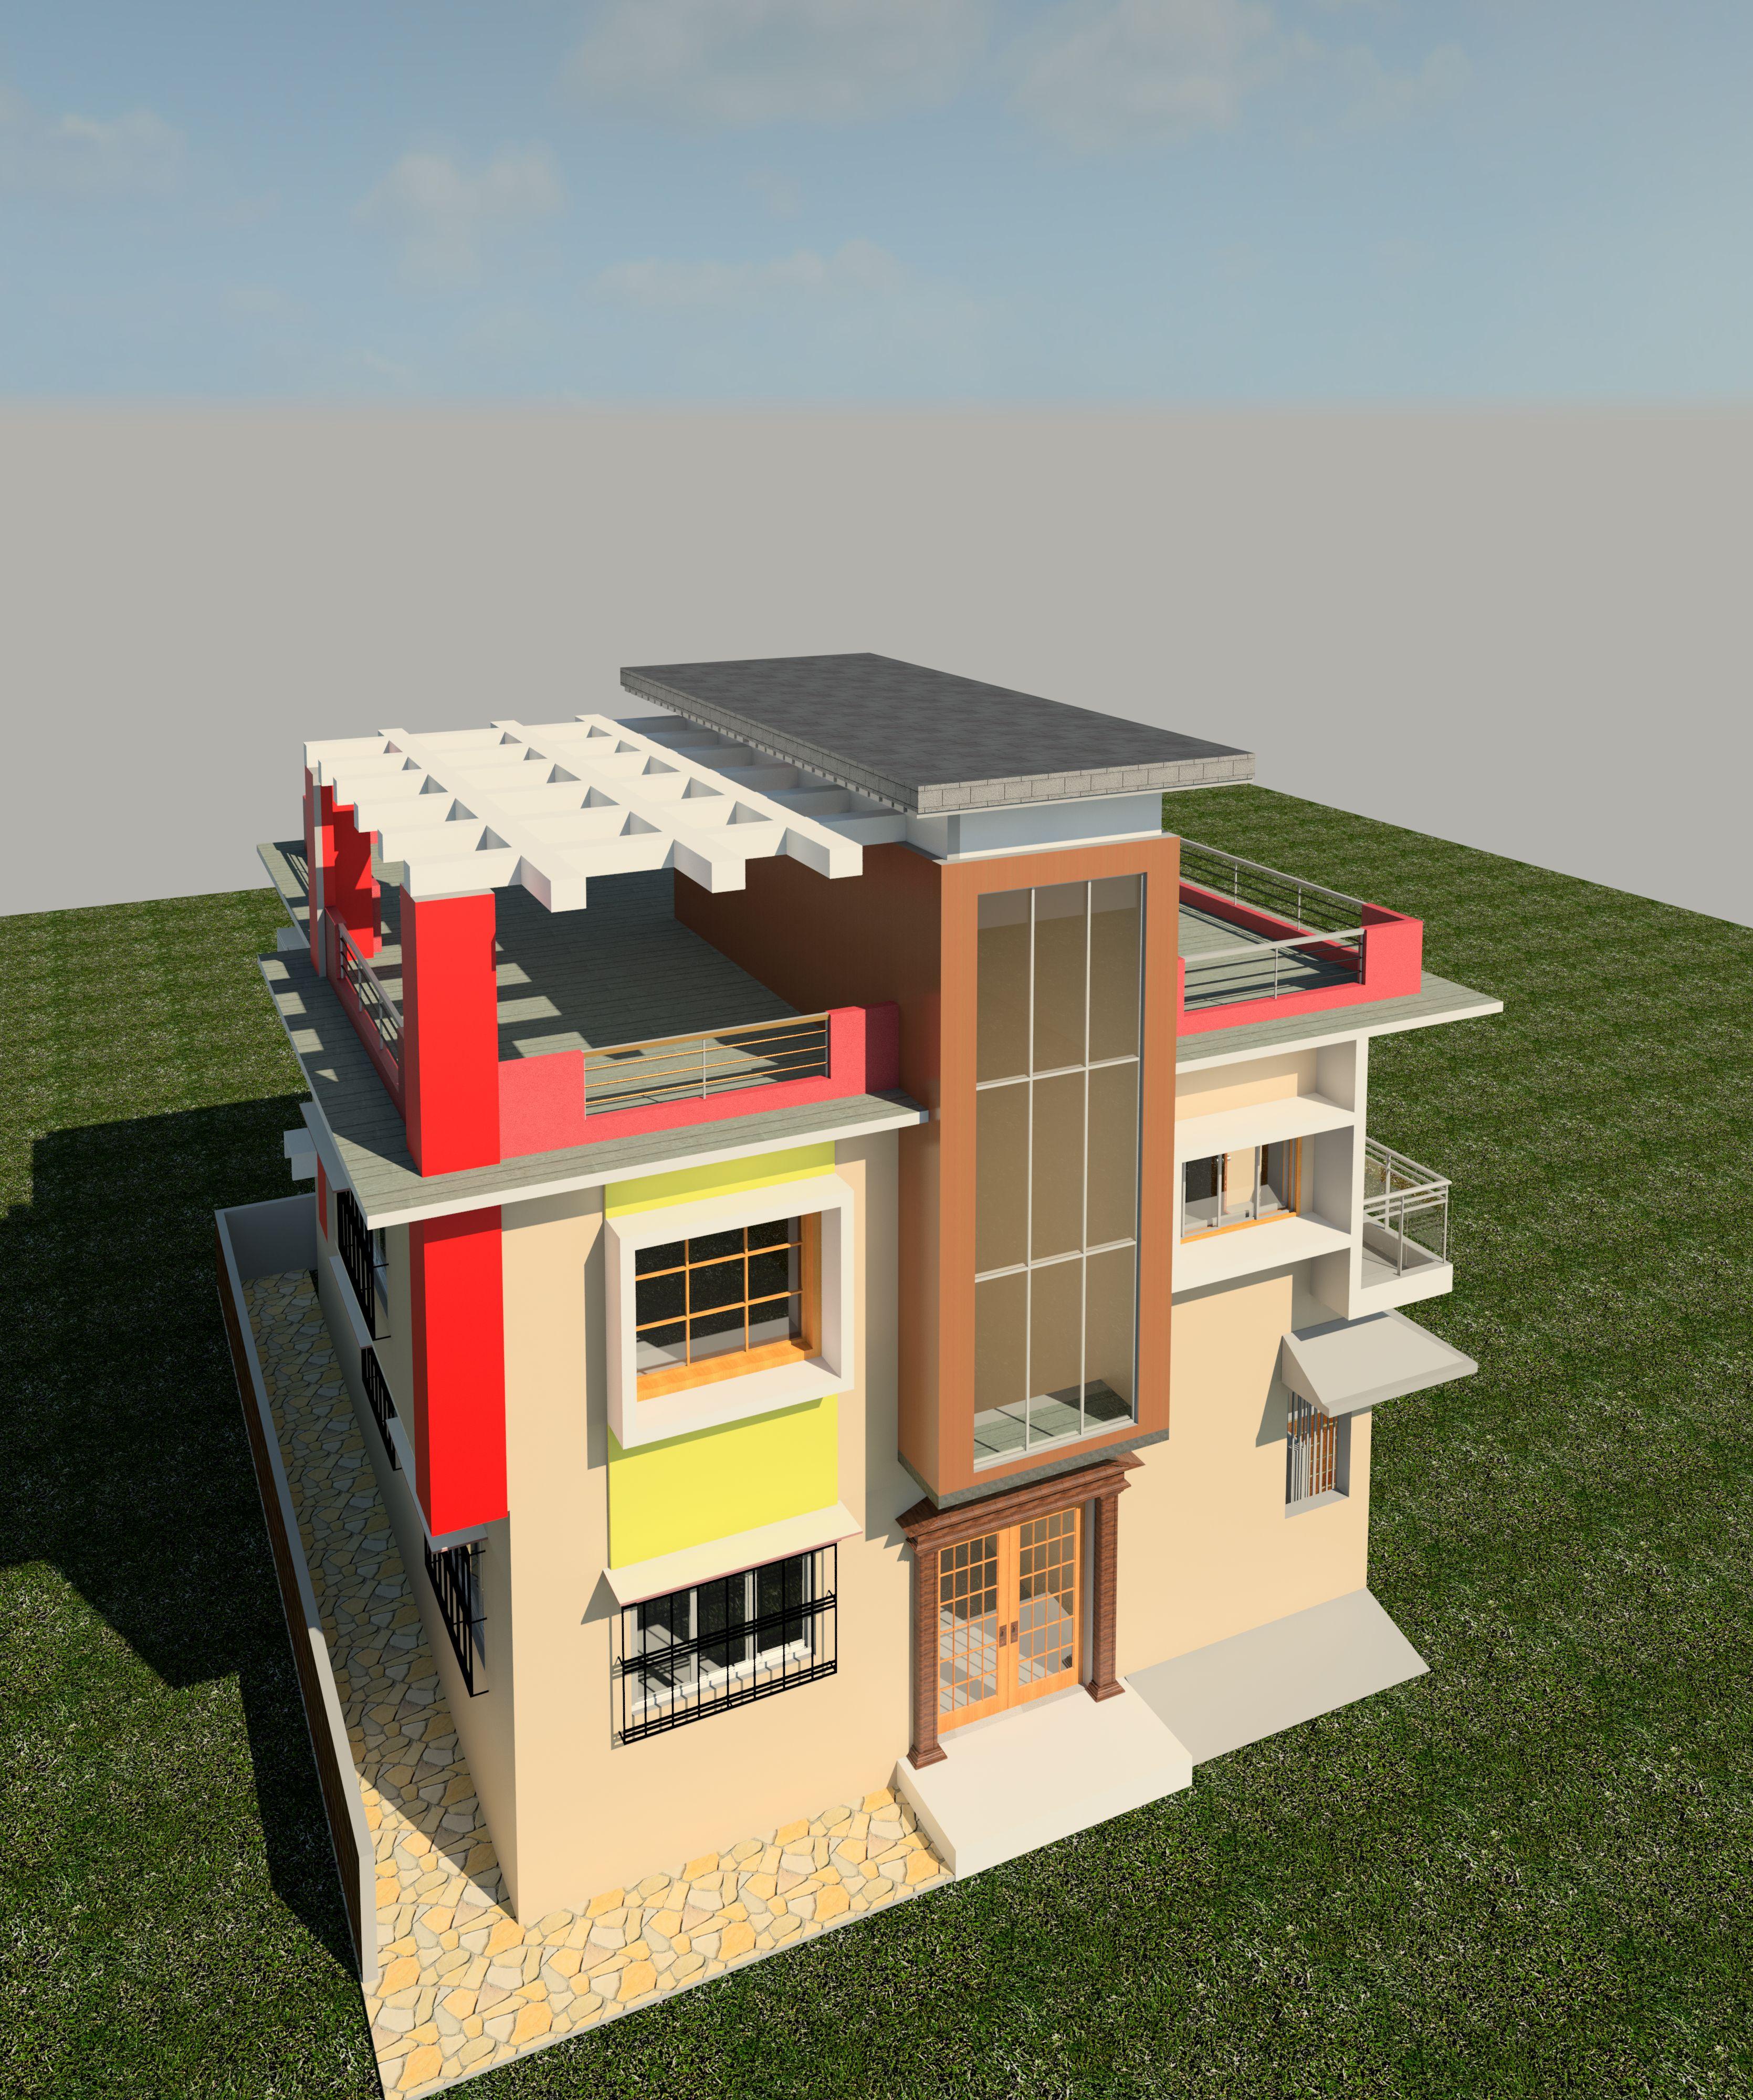 House design revit - Indian House House Design